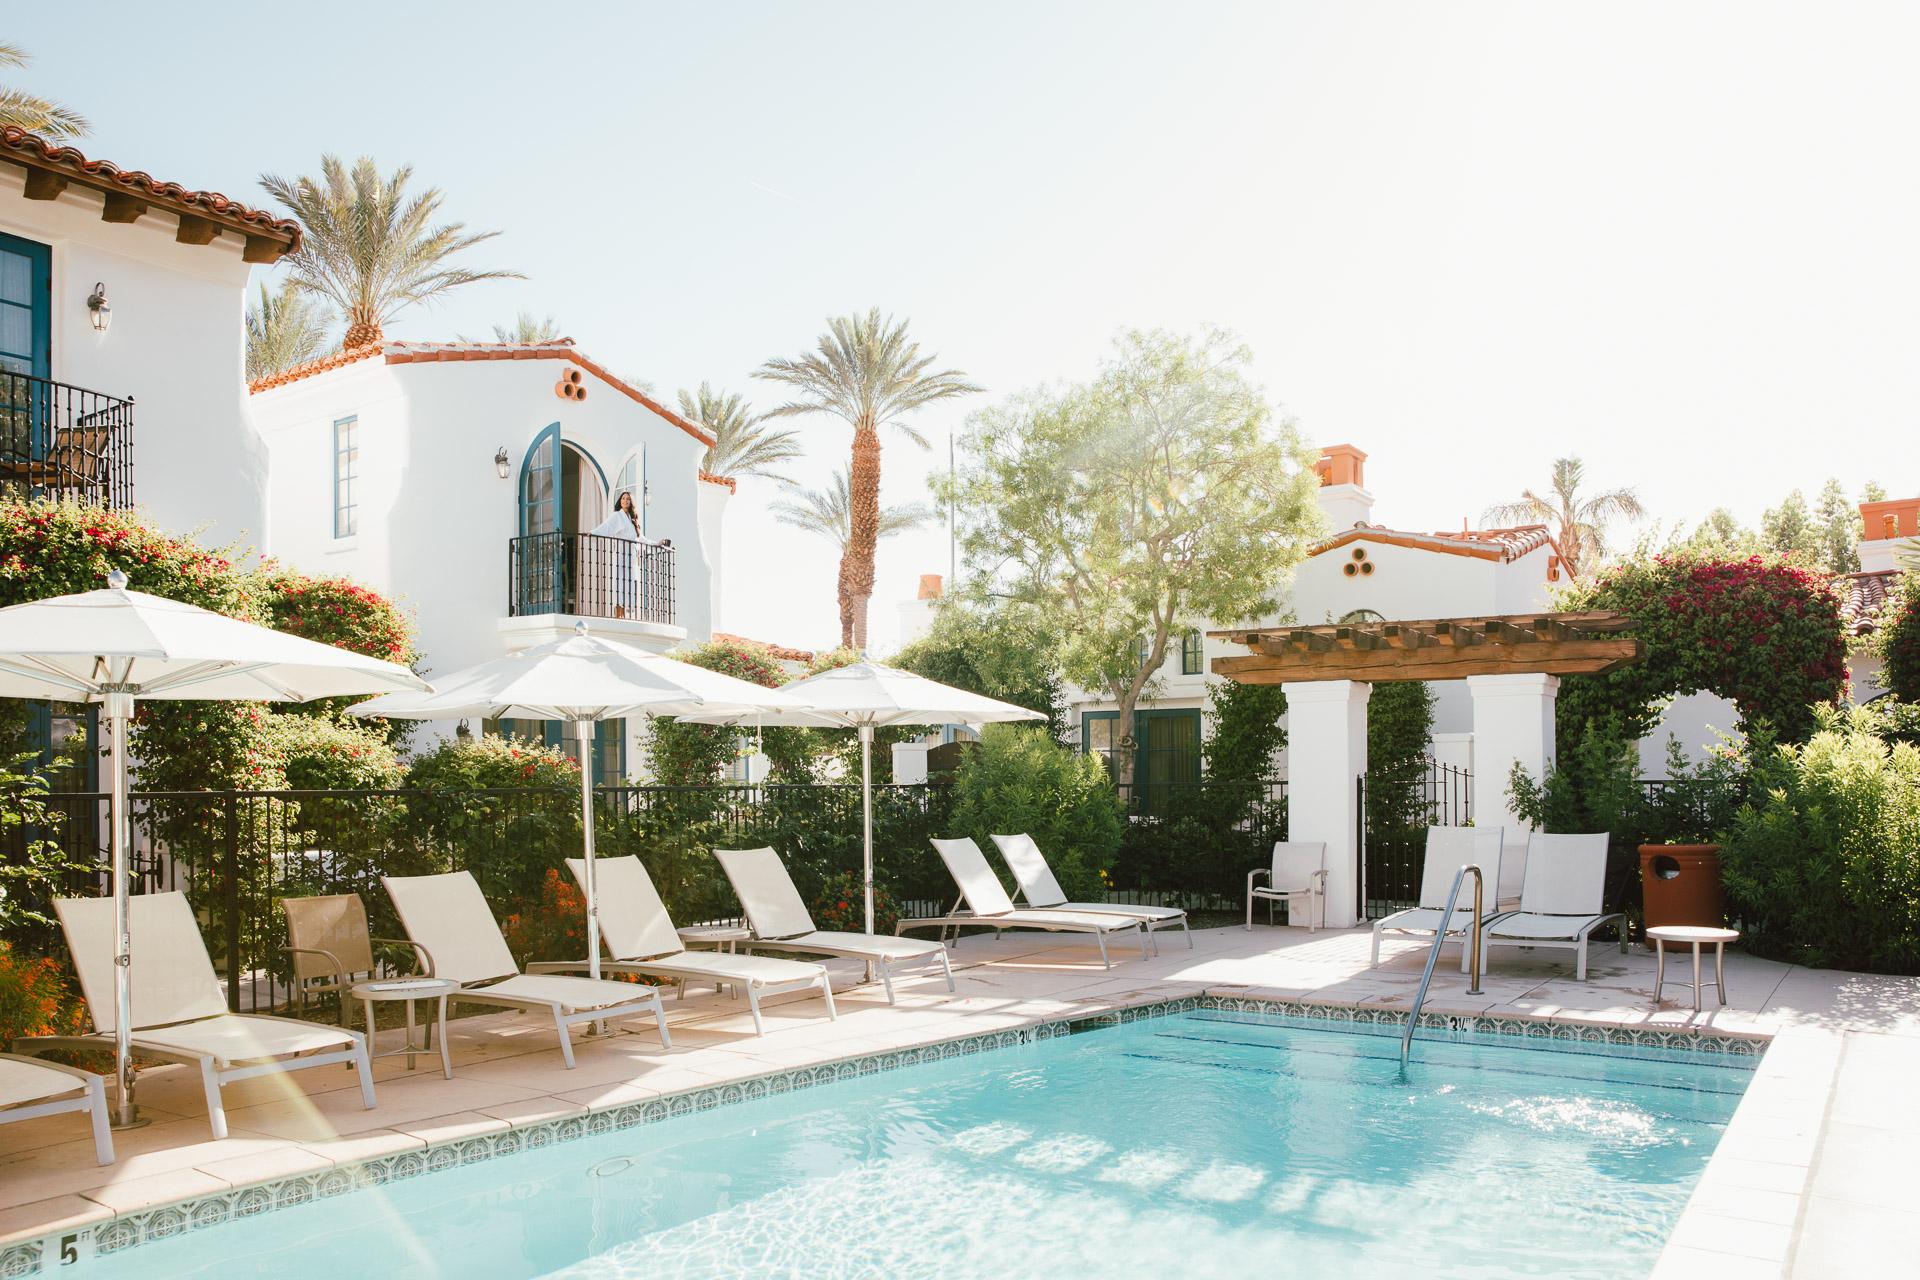 palm-springs-california-hotel-lifestyle-photographer-la-quinta-resort-club-10.jpg